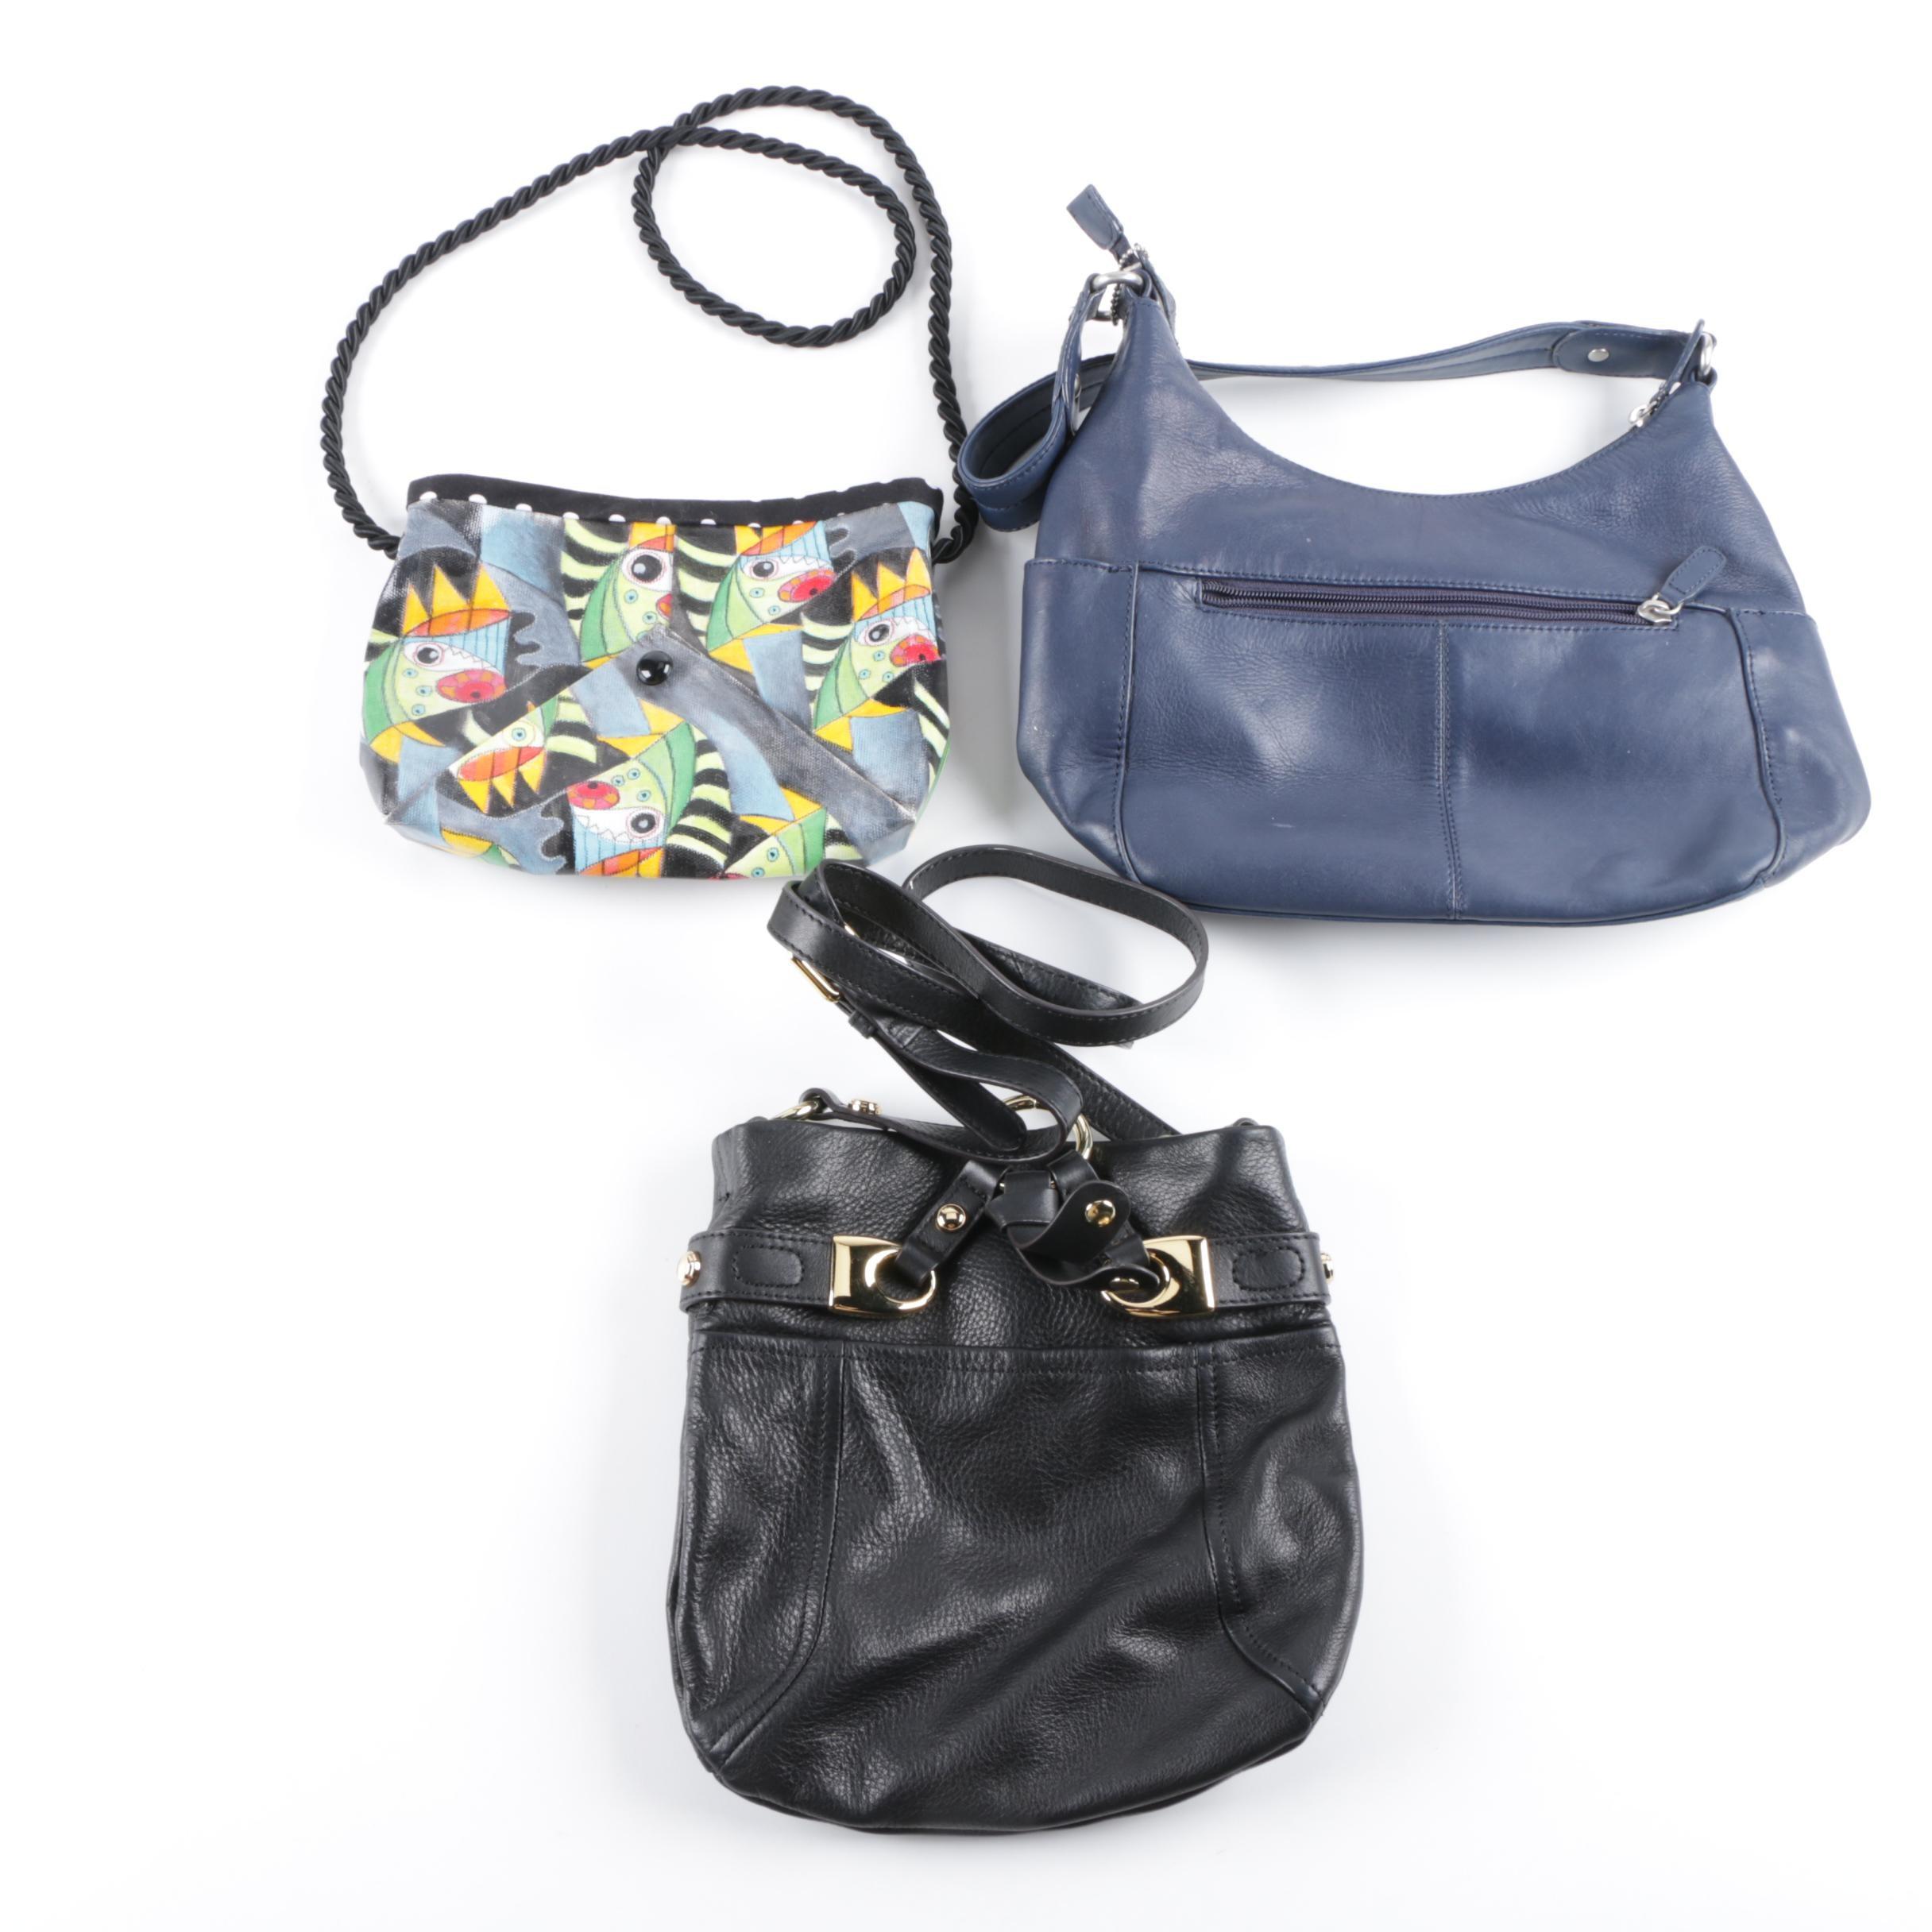 Shoulder Bags Including B. Makowsky, Aye 4 Art Robin West and St. John's Bay